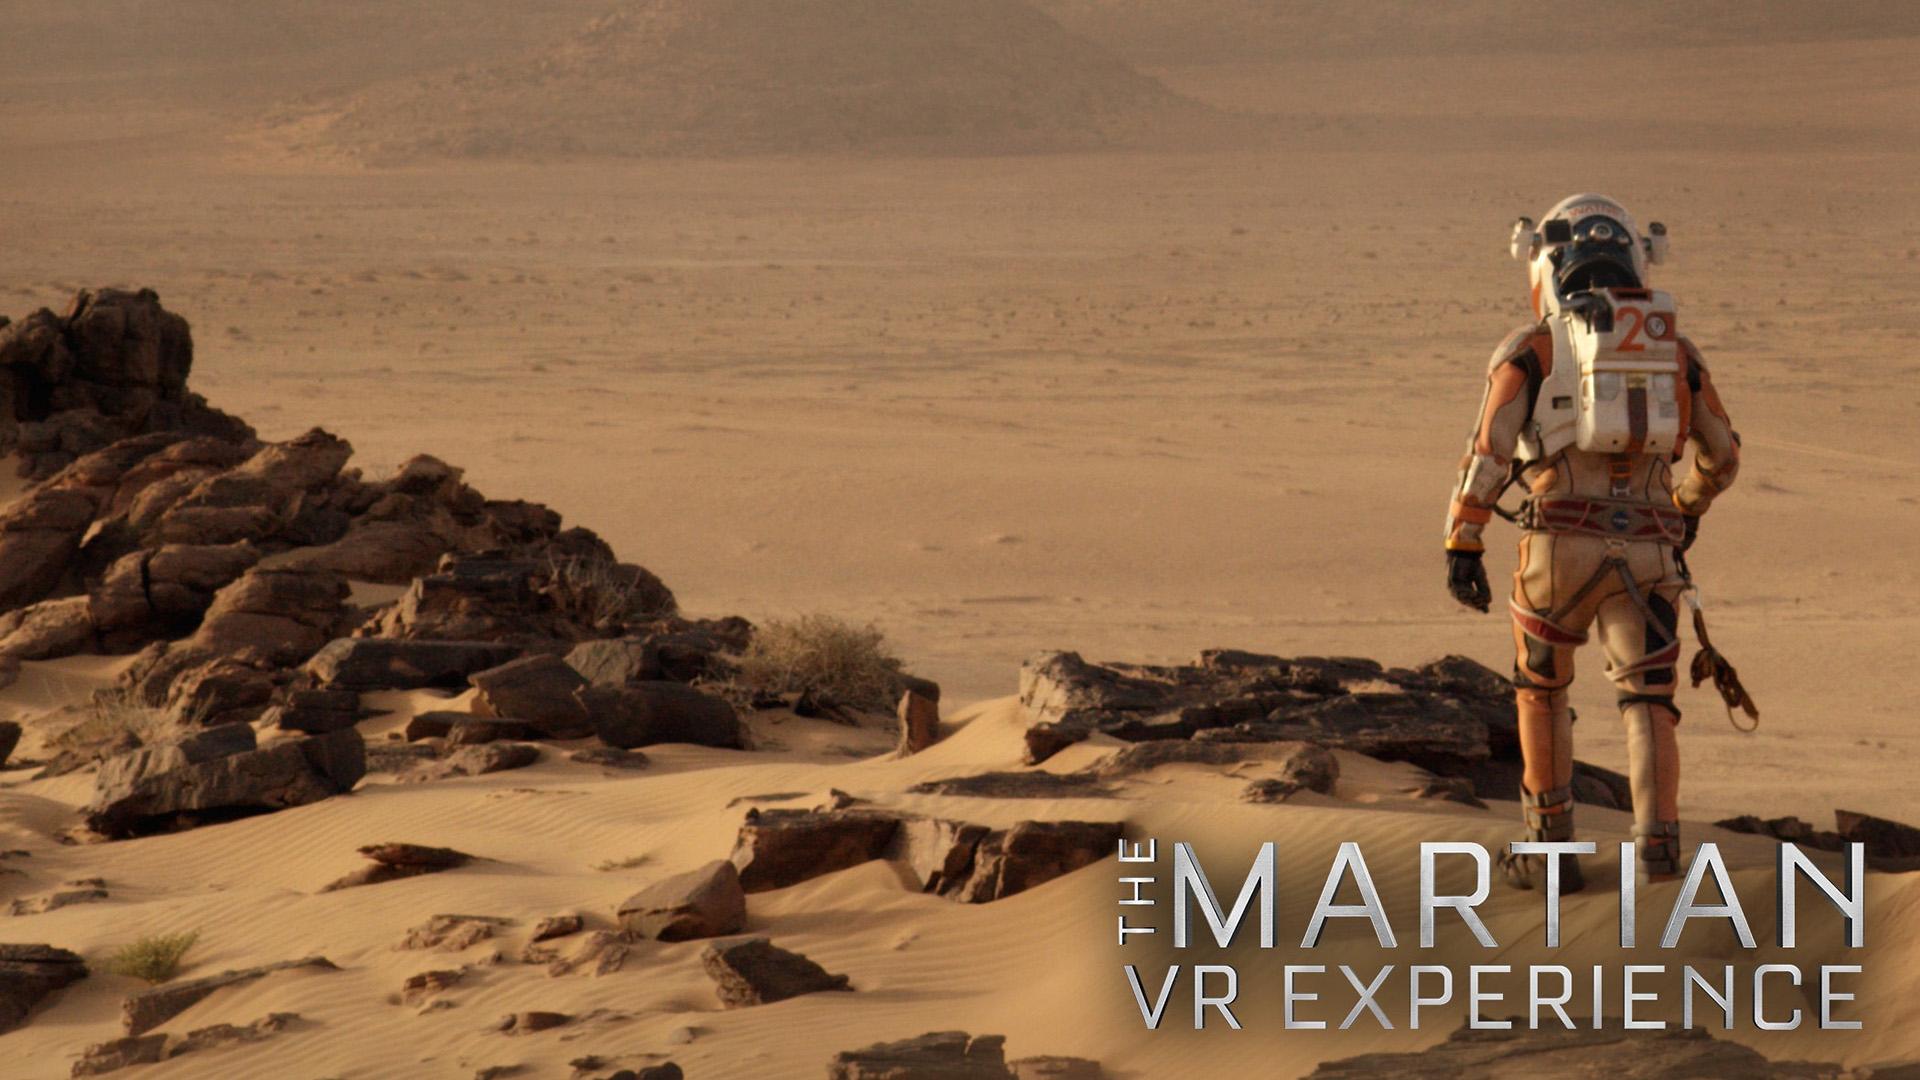 VRC_Martian_VR_Experience4.jpg